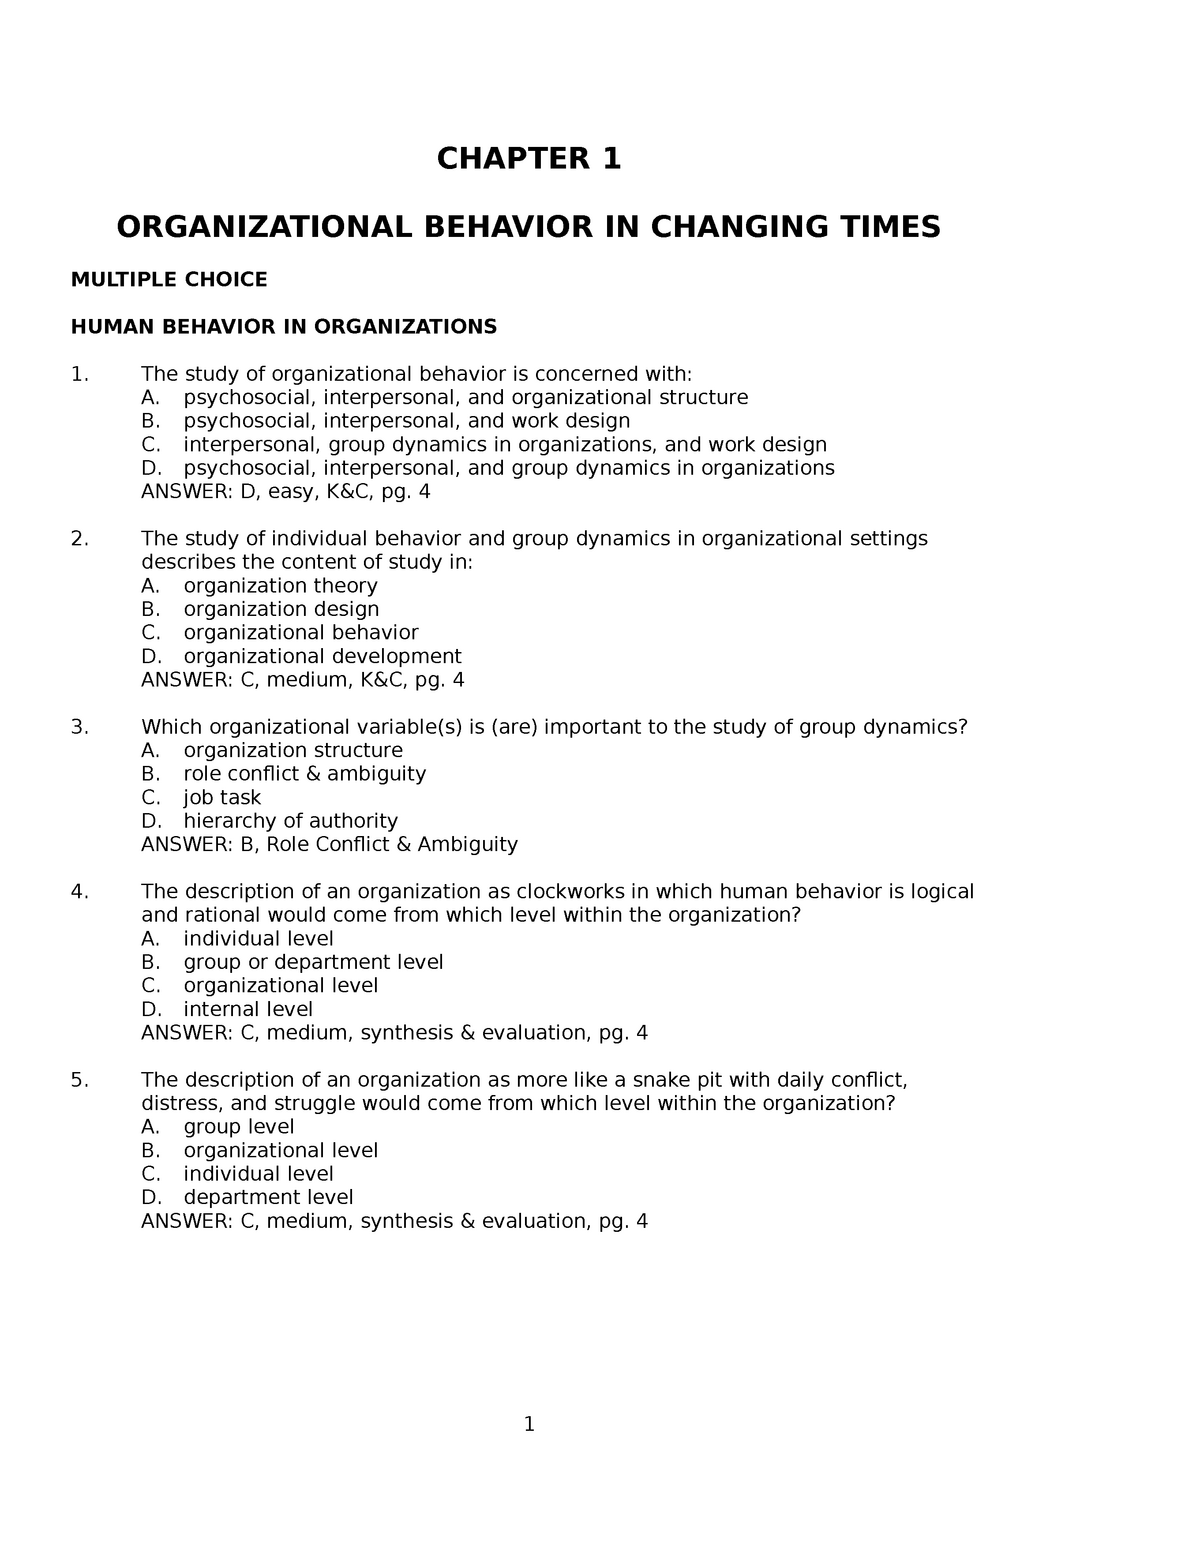 Orgainzation behaviour mcq questions - BBS-201 - StuDocu